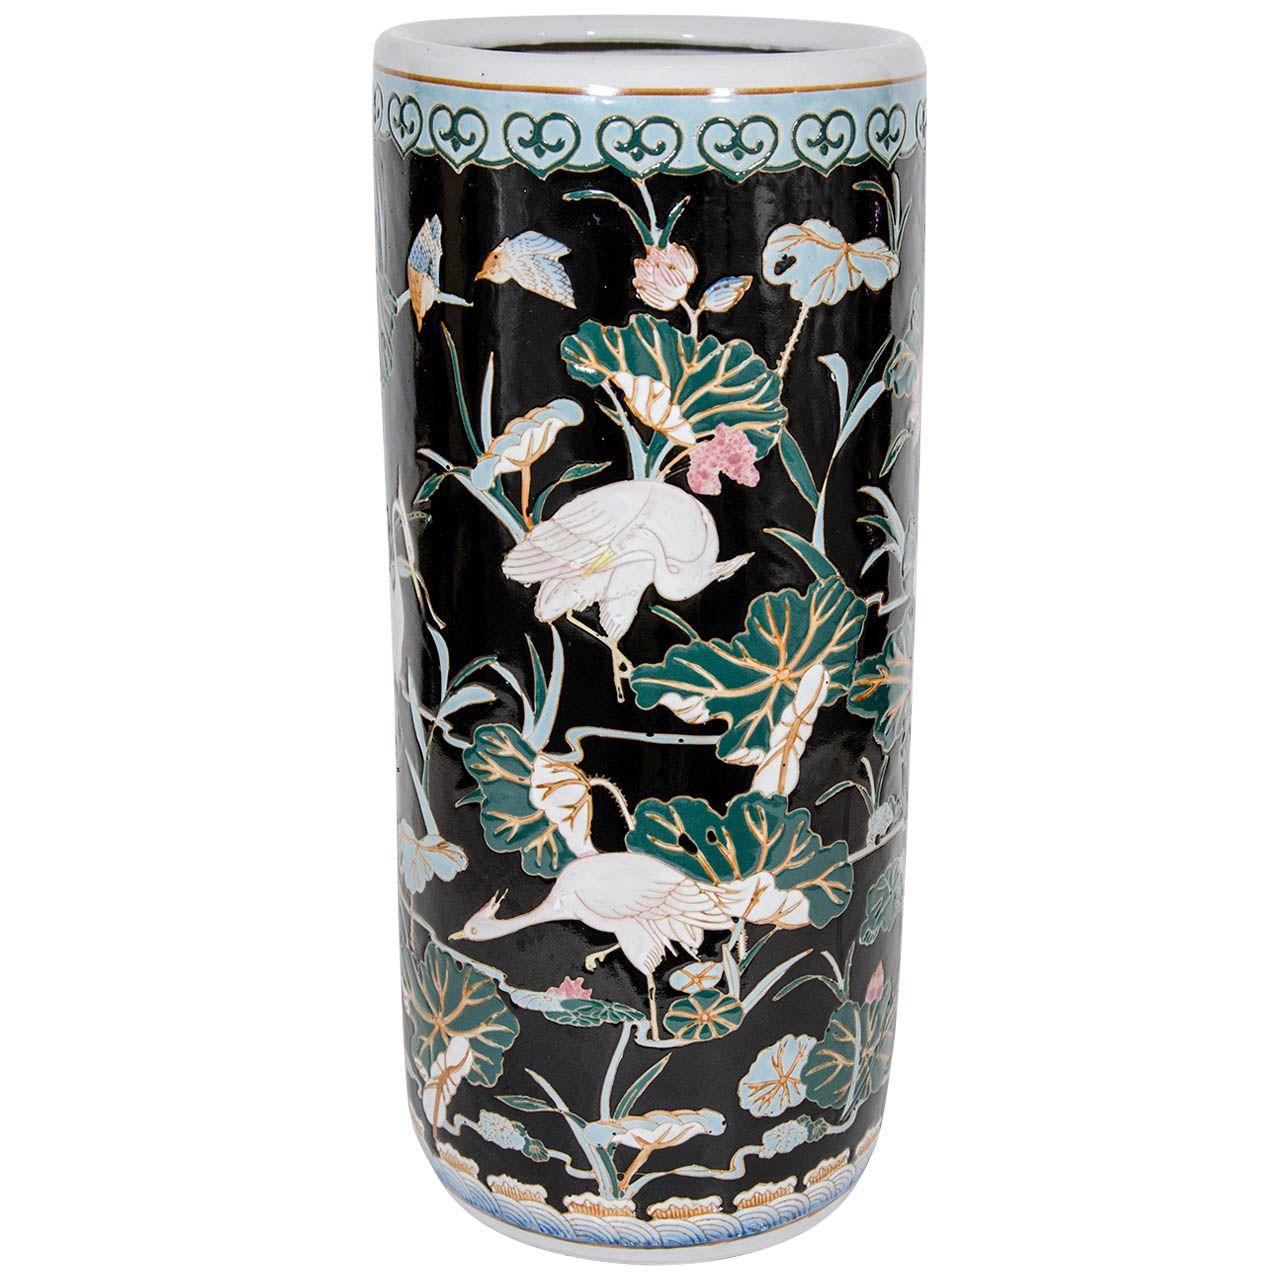 Exquisite porcelain umbrella stand with hand painted oriental exquisite porcelain umbrella stand with hand painted oriental designs reviewsmspy